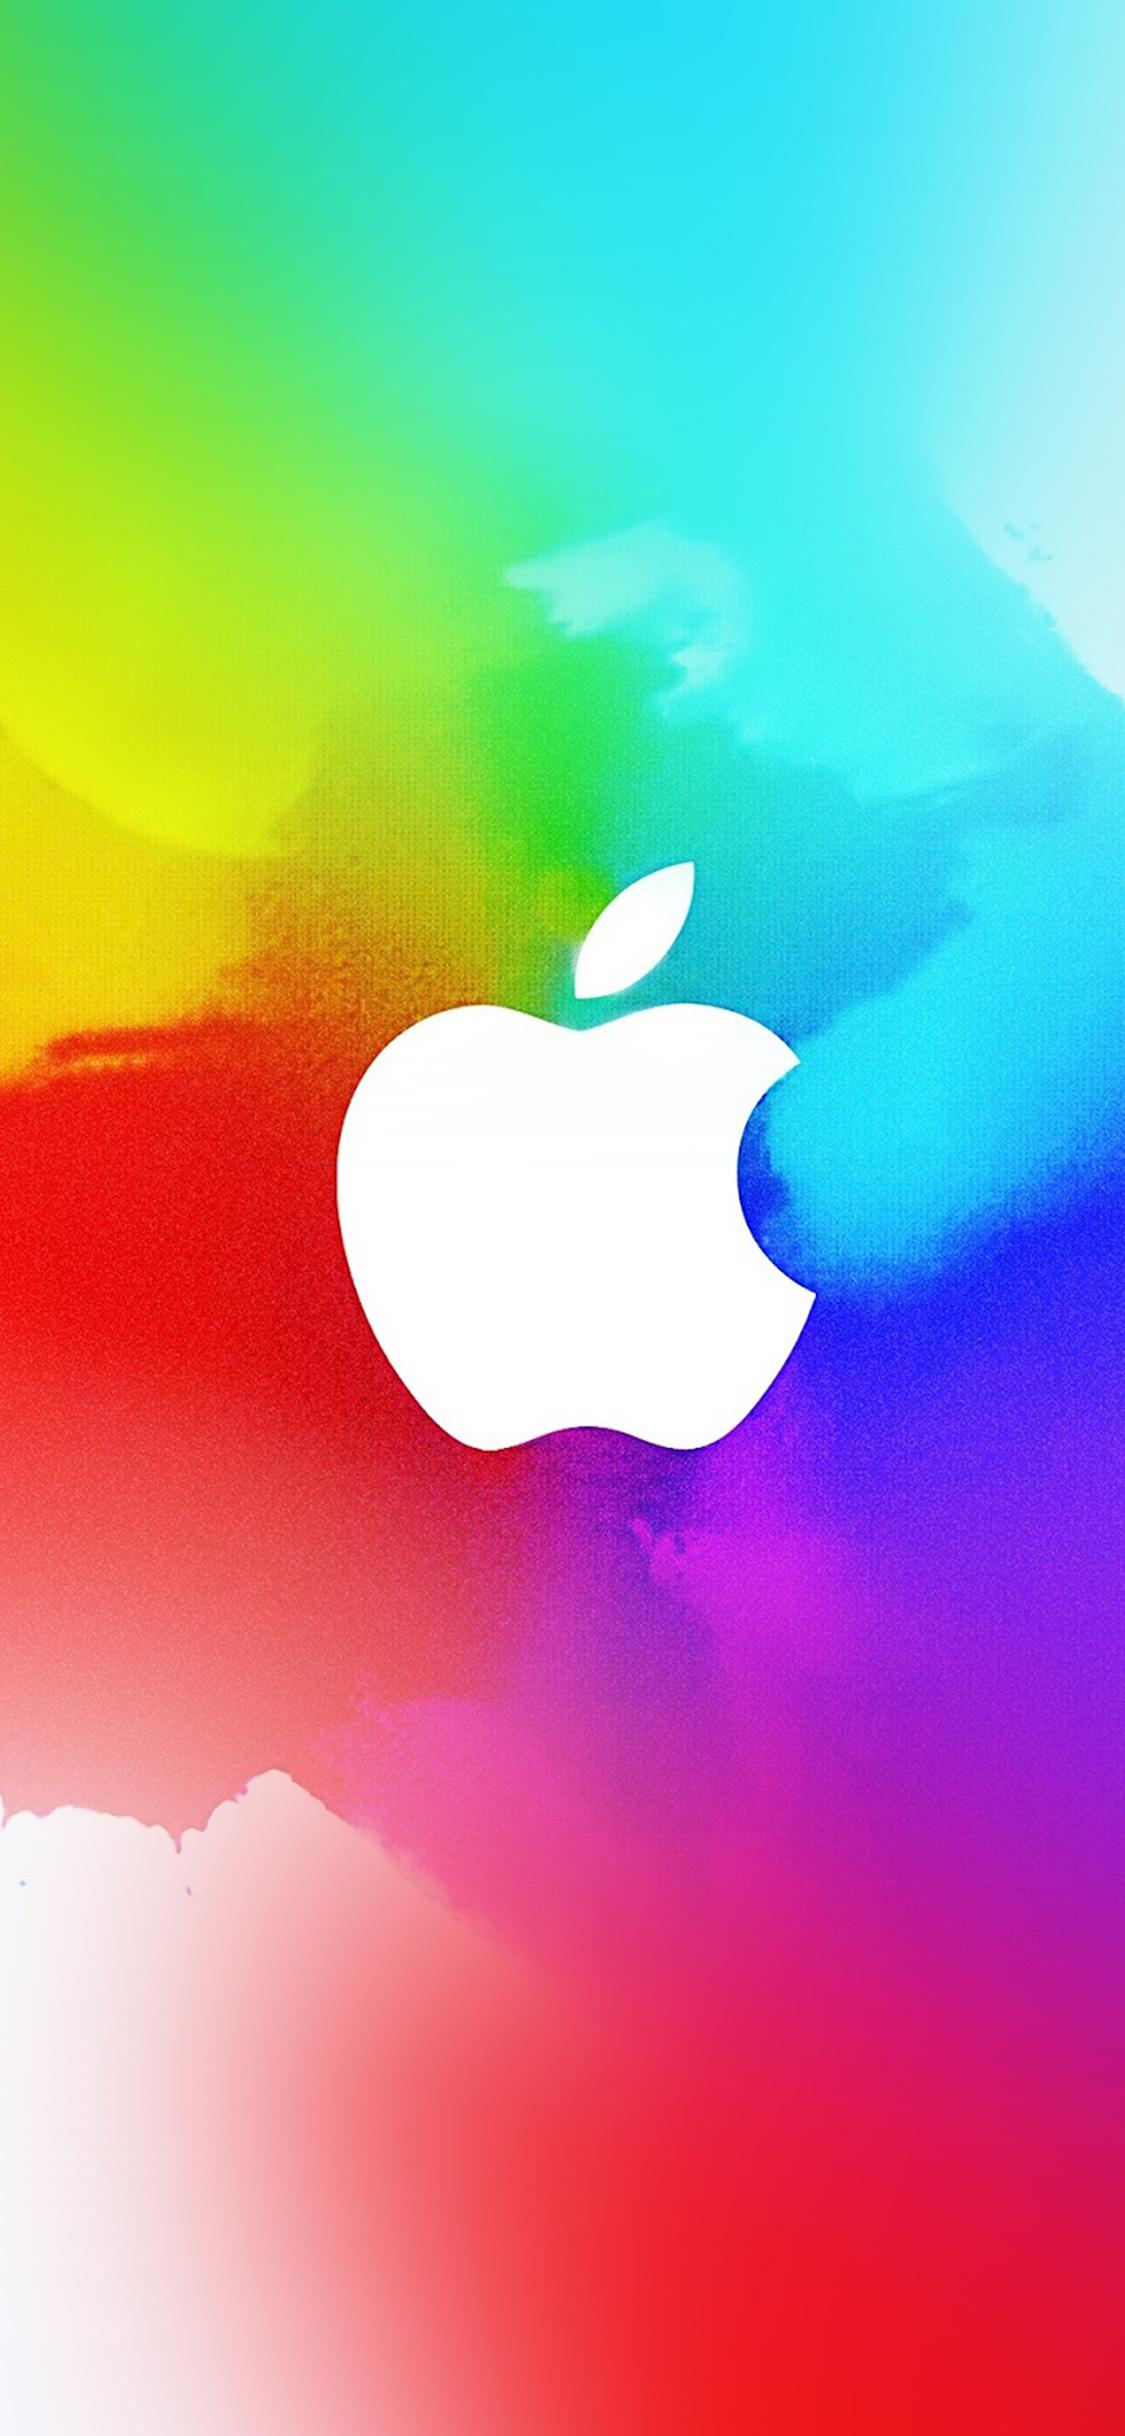 Ay37 Apple Logo Splash Color Paint Illustration Art Wallpaper